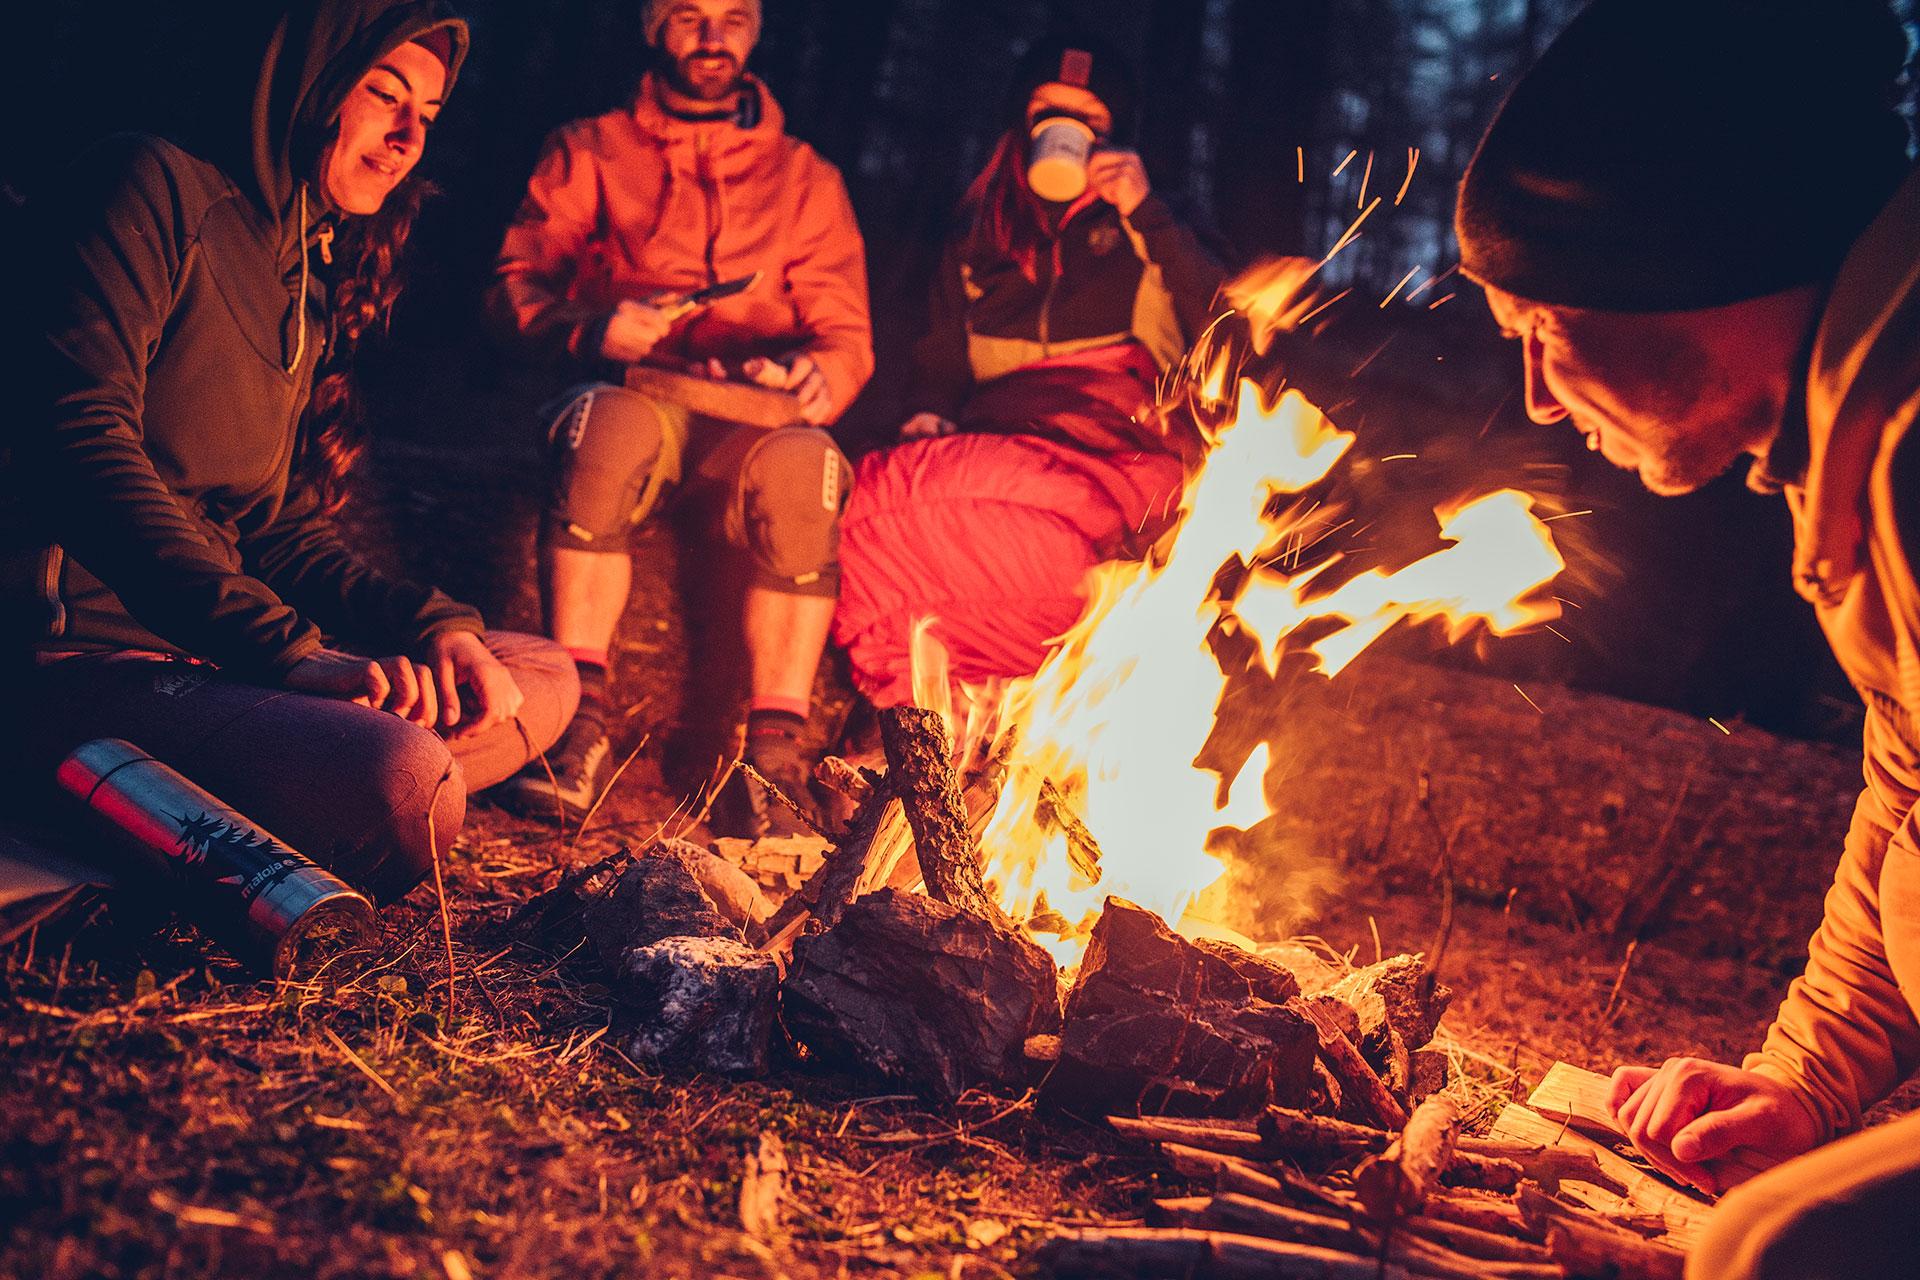 Fotograf Michael Müller Outdoor Sport People Mountainbike Deuter Campen Feuer